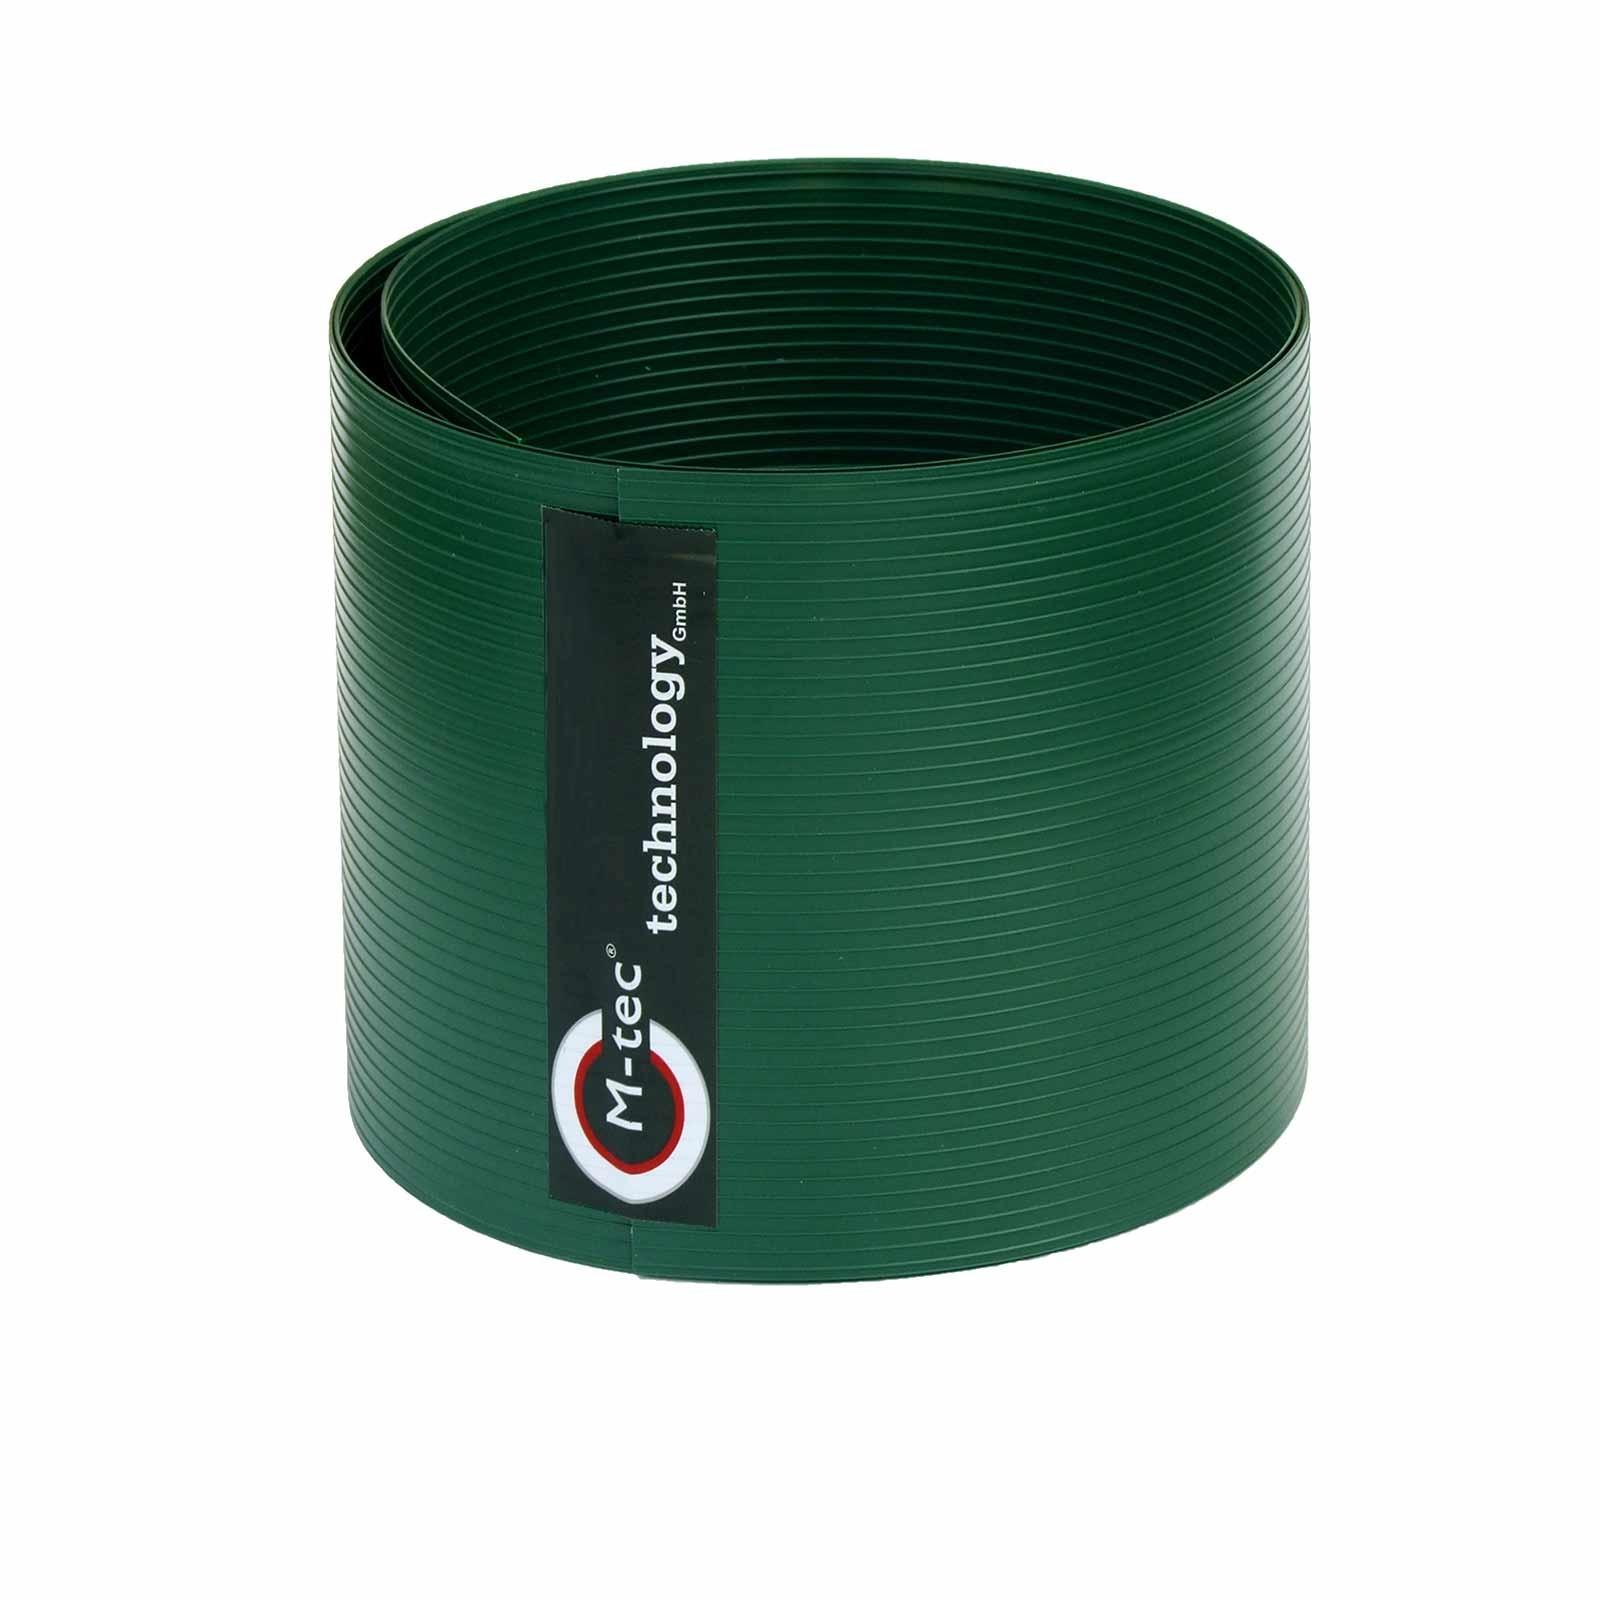 M-tec Pro-secure Hart PVC Sichtschutzstreifen - moosgrün